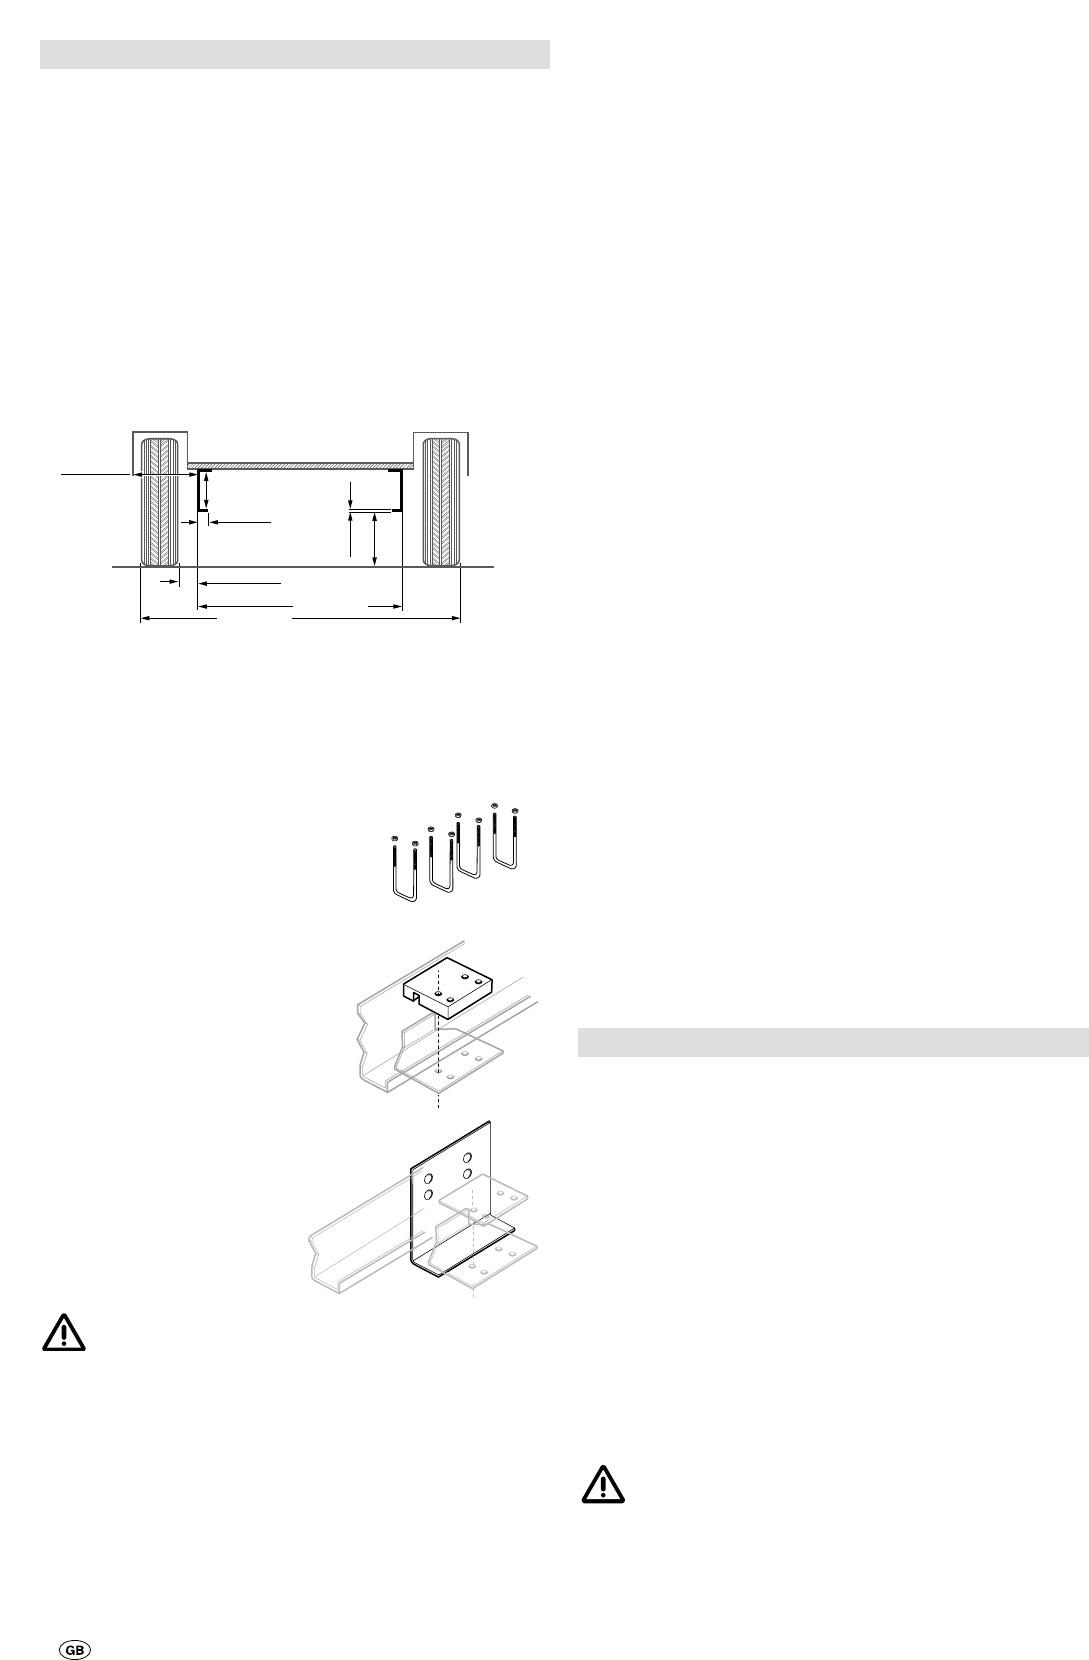 Wiring Diagram For Truma Motor Mover Caravan Heater Handleiding Euro Pagina 6 Van 42